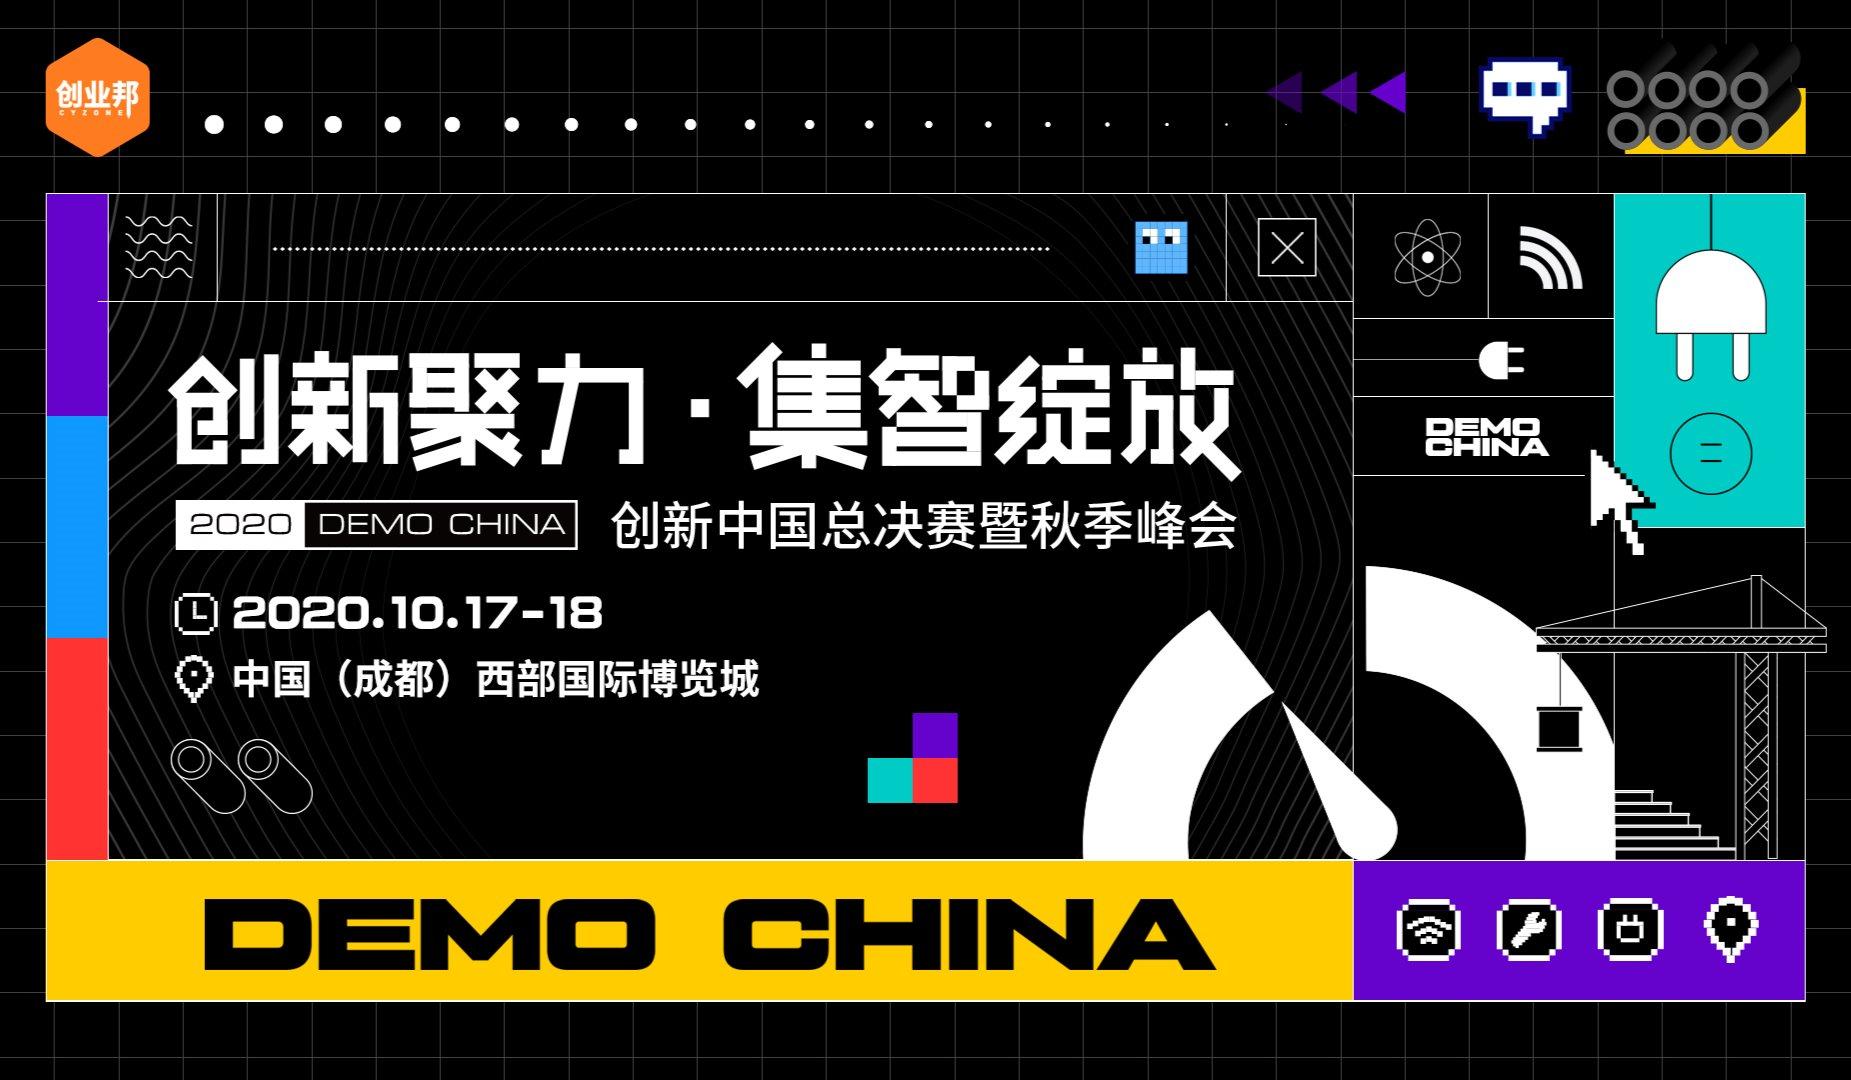 2020 DEMO CHINA 创新中国总决赛暨秋季峰会